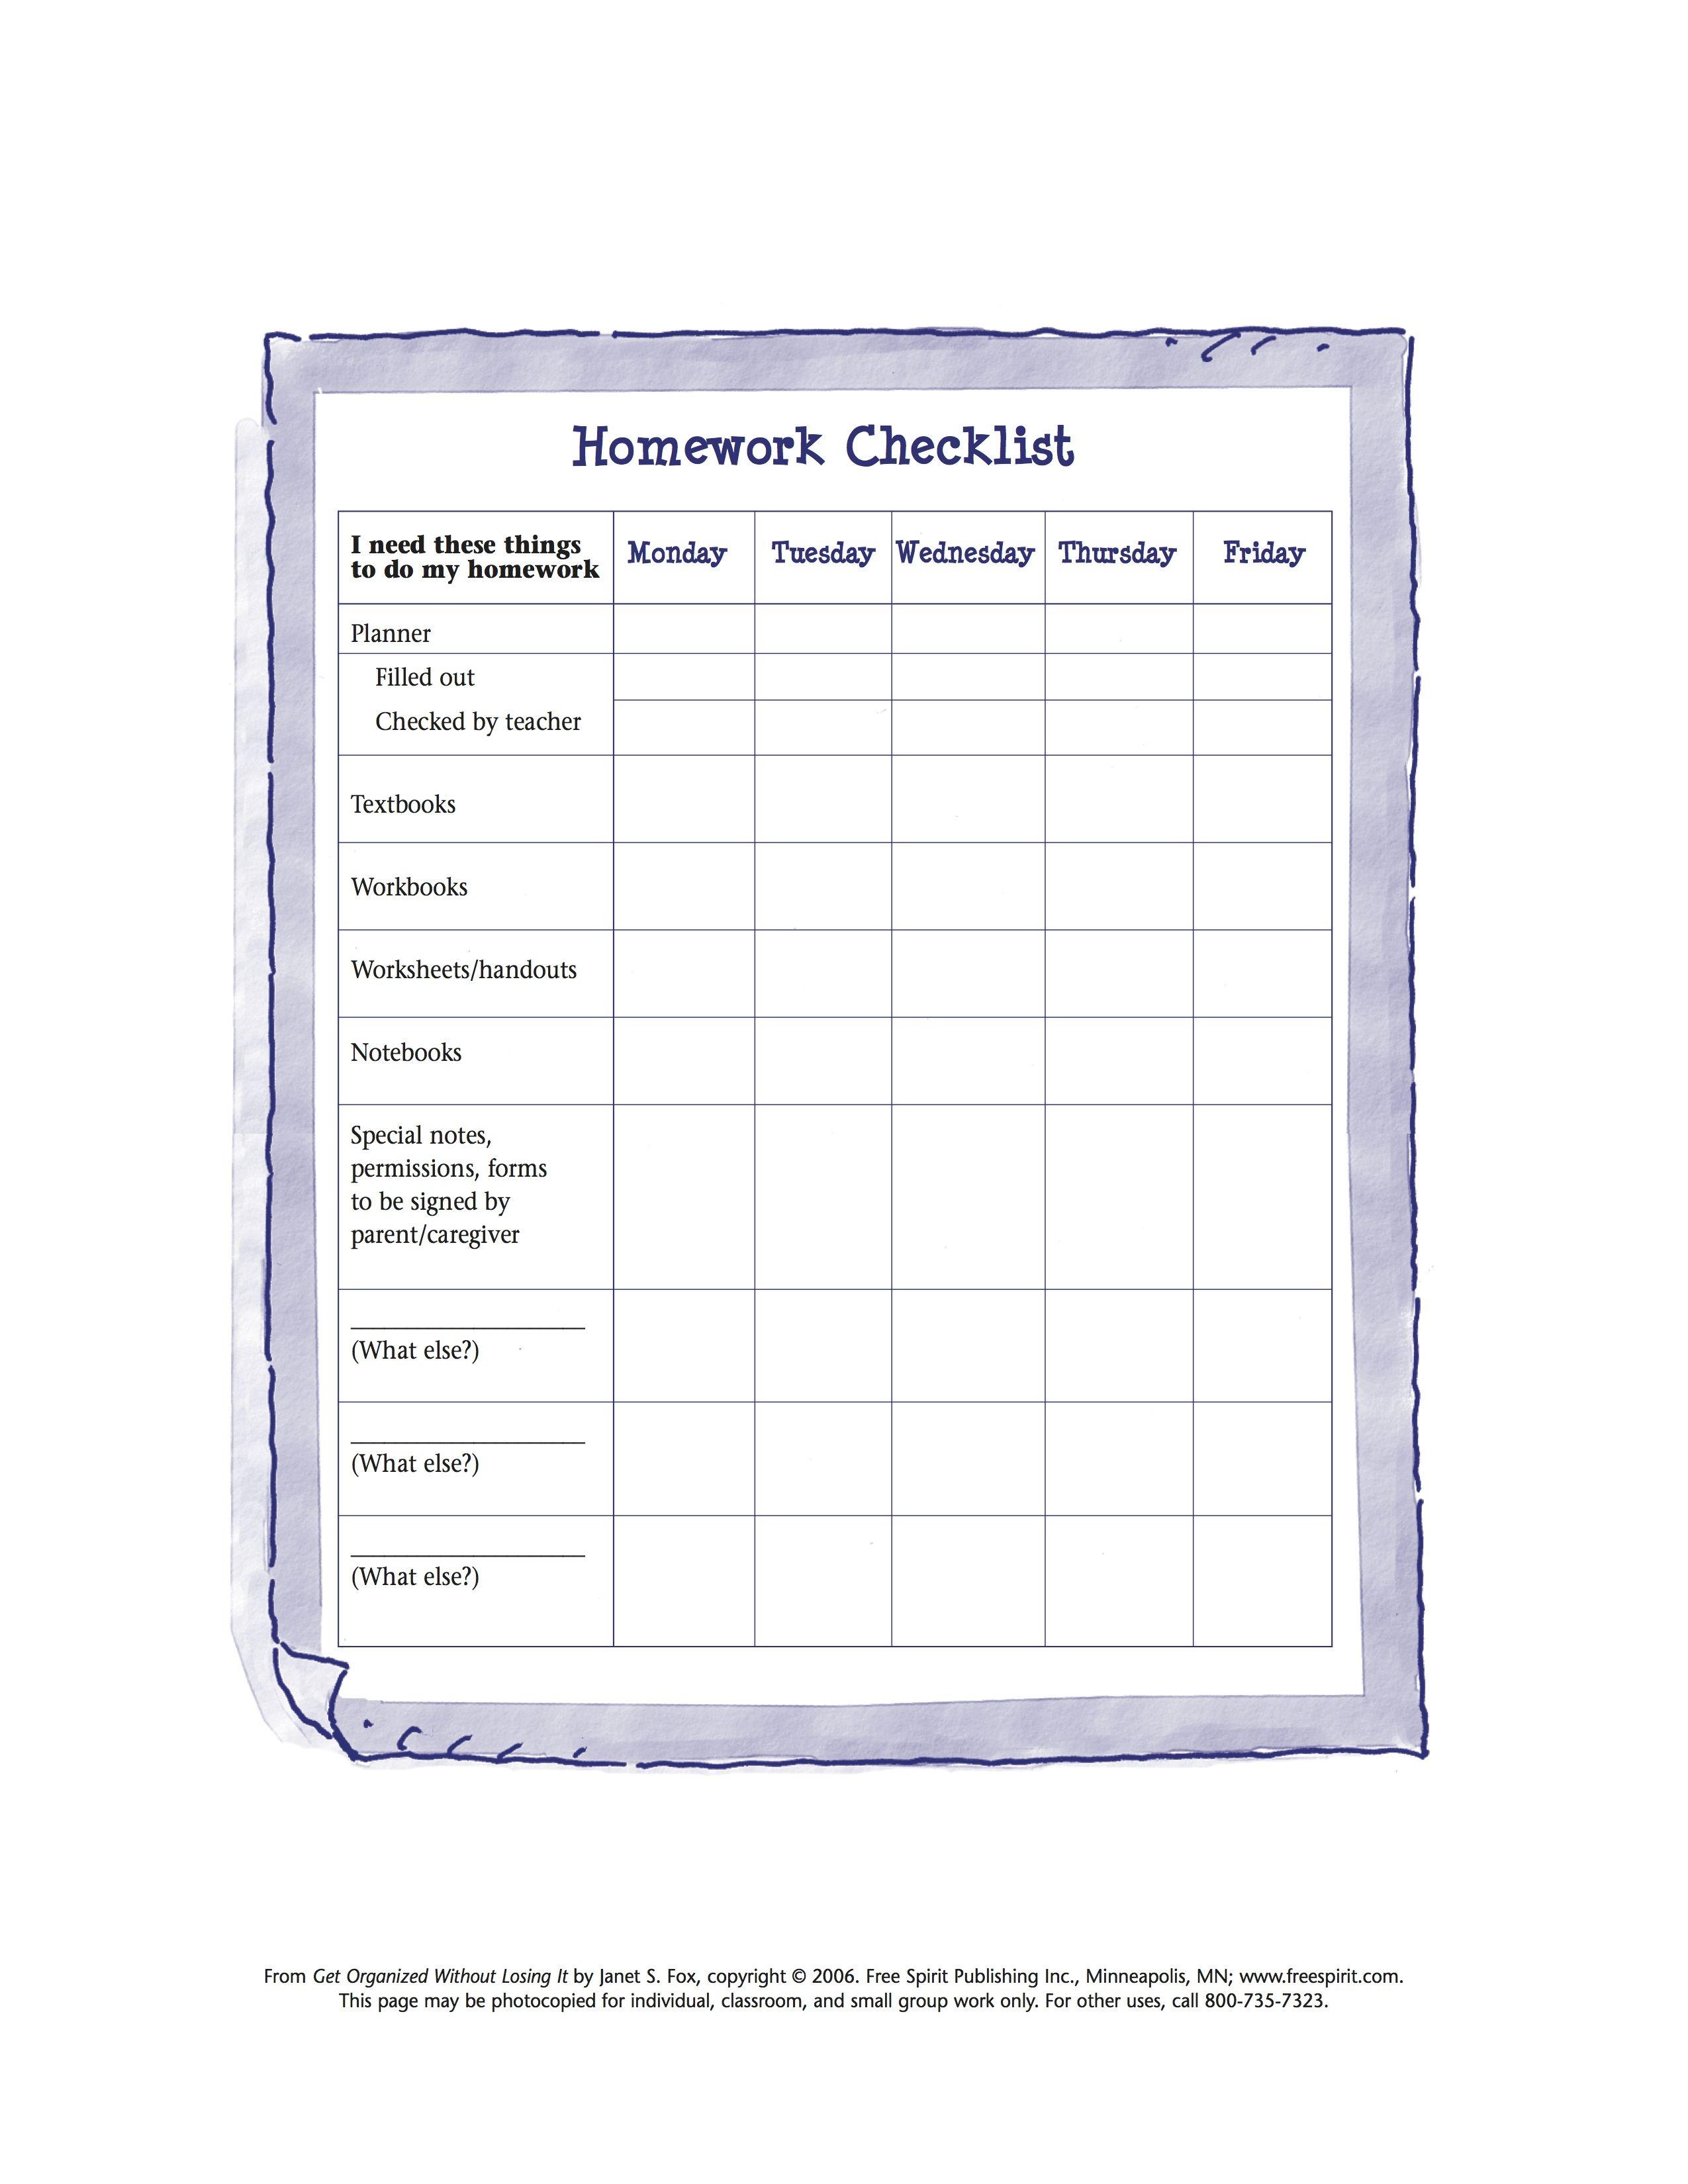 Free Printable Worksheet To Help Kids Organize Tools Needed For - Free Printable Homework Worksheets